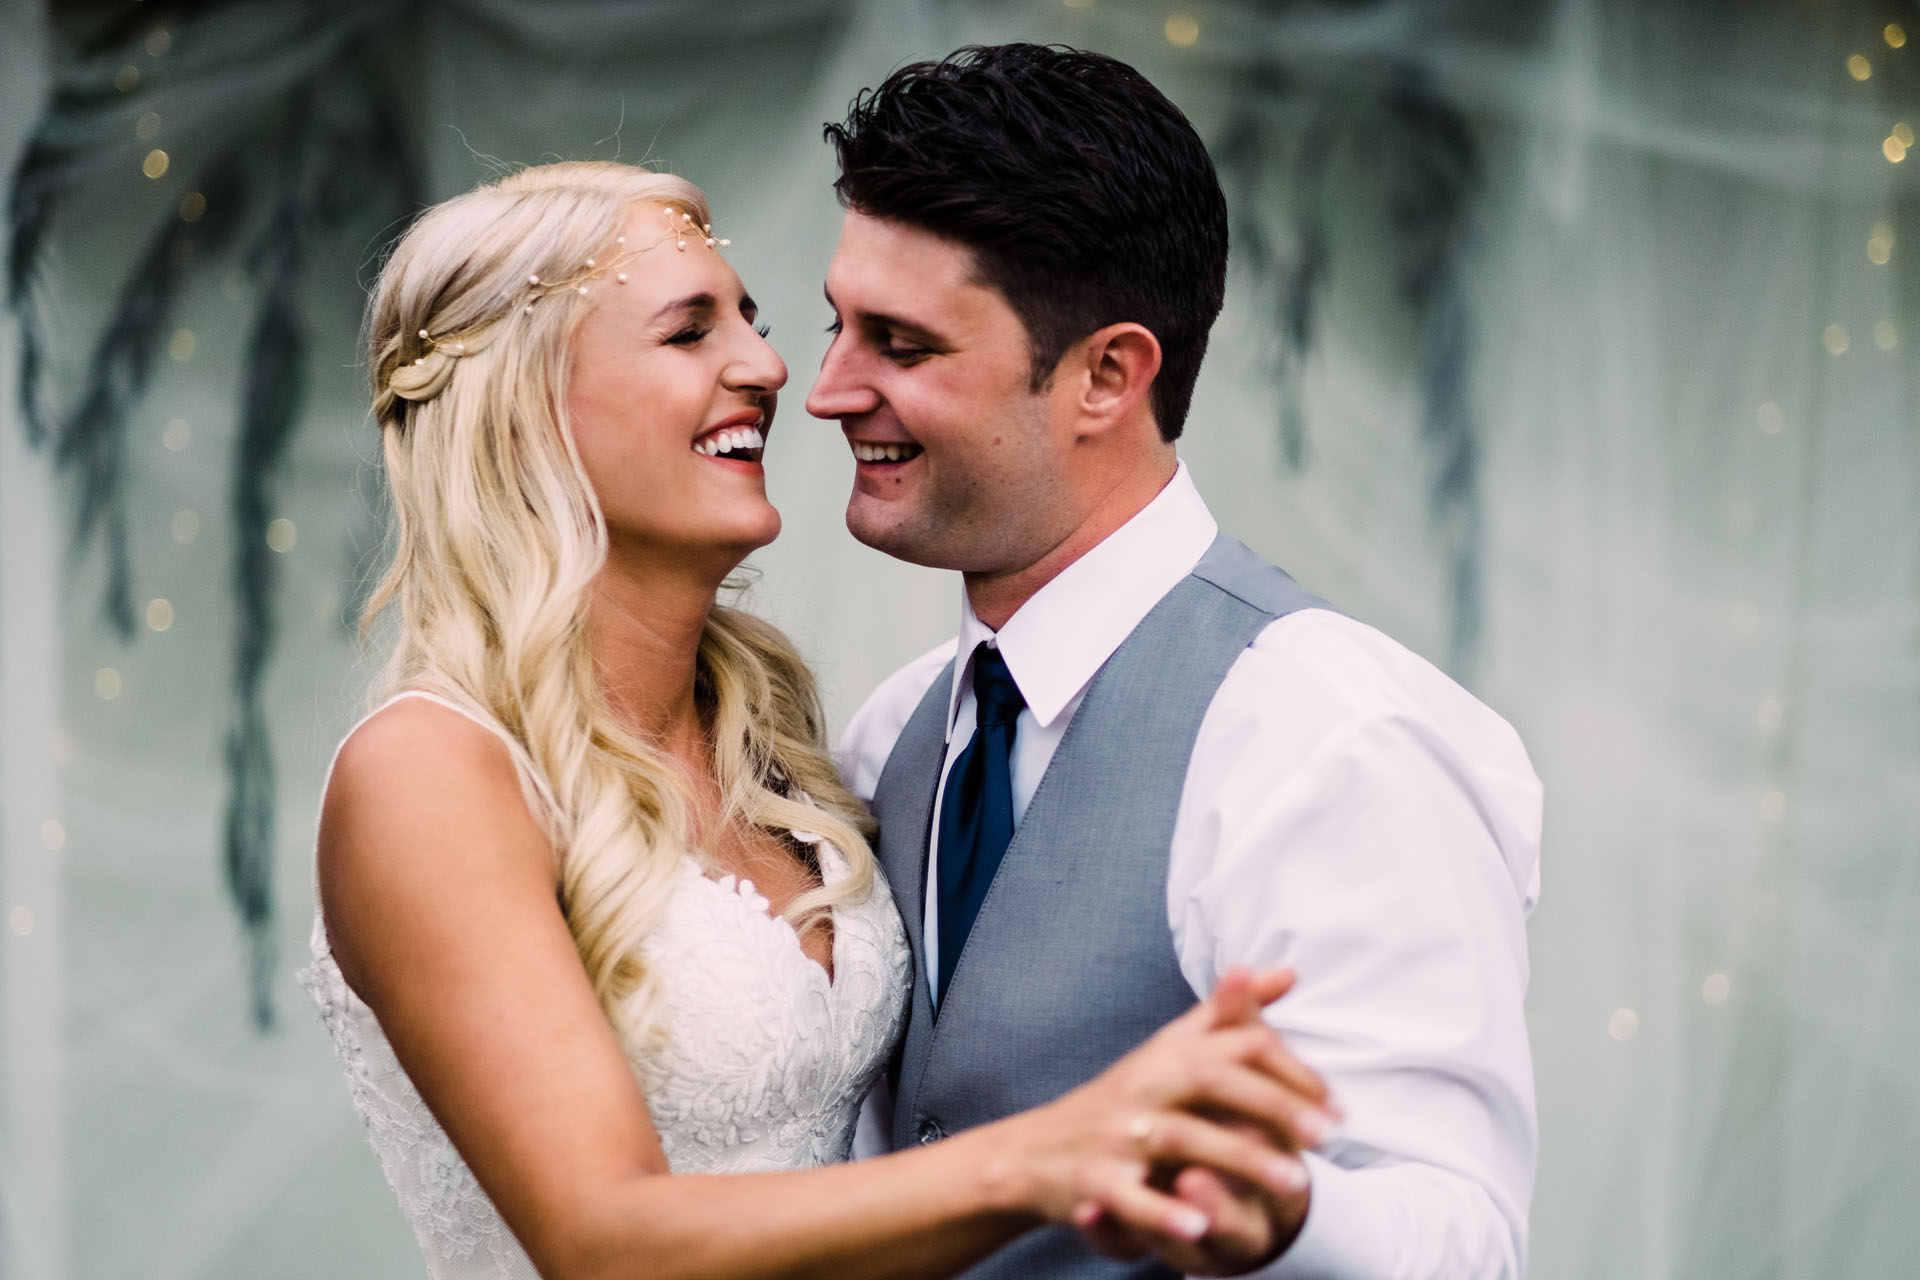 10-7-17 Devon and Jordan's Wedding-217.jpg